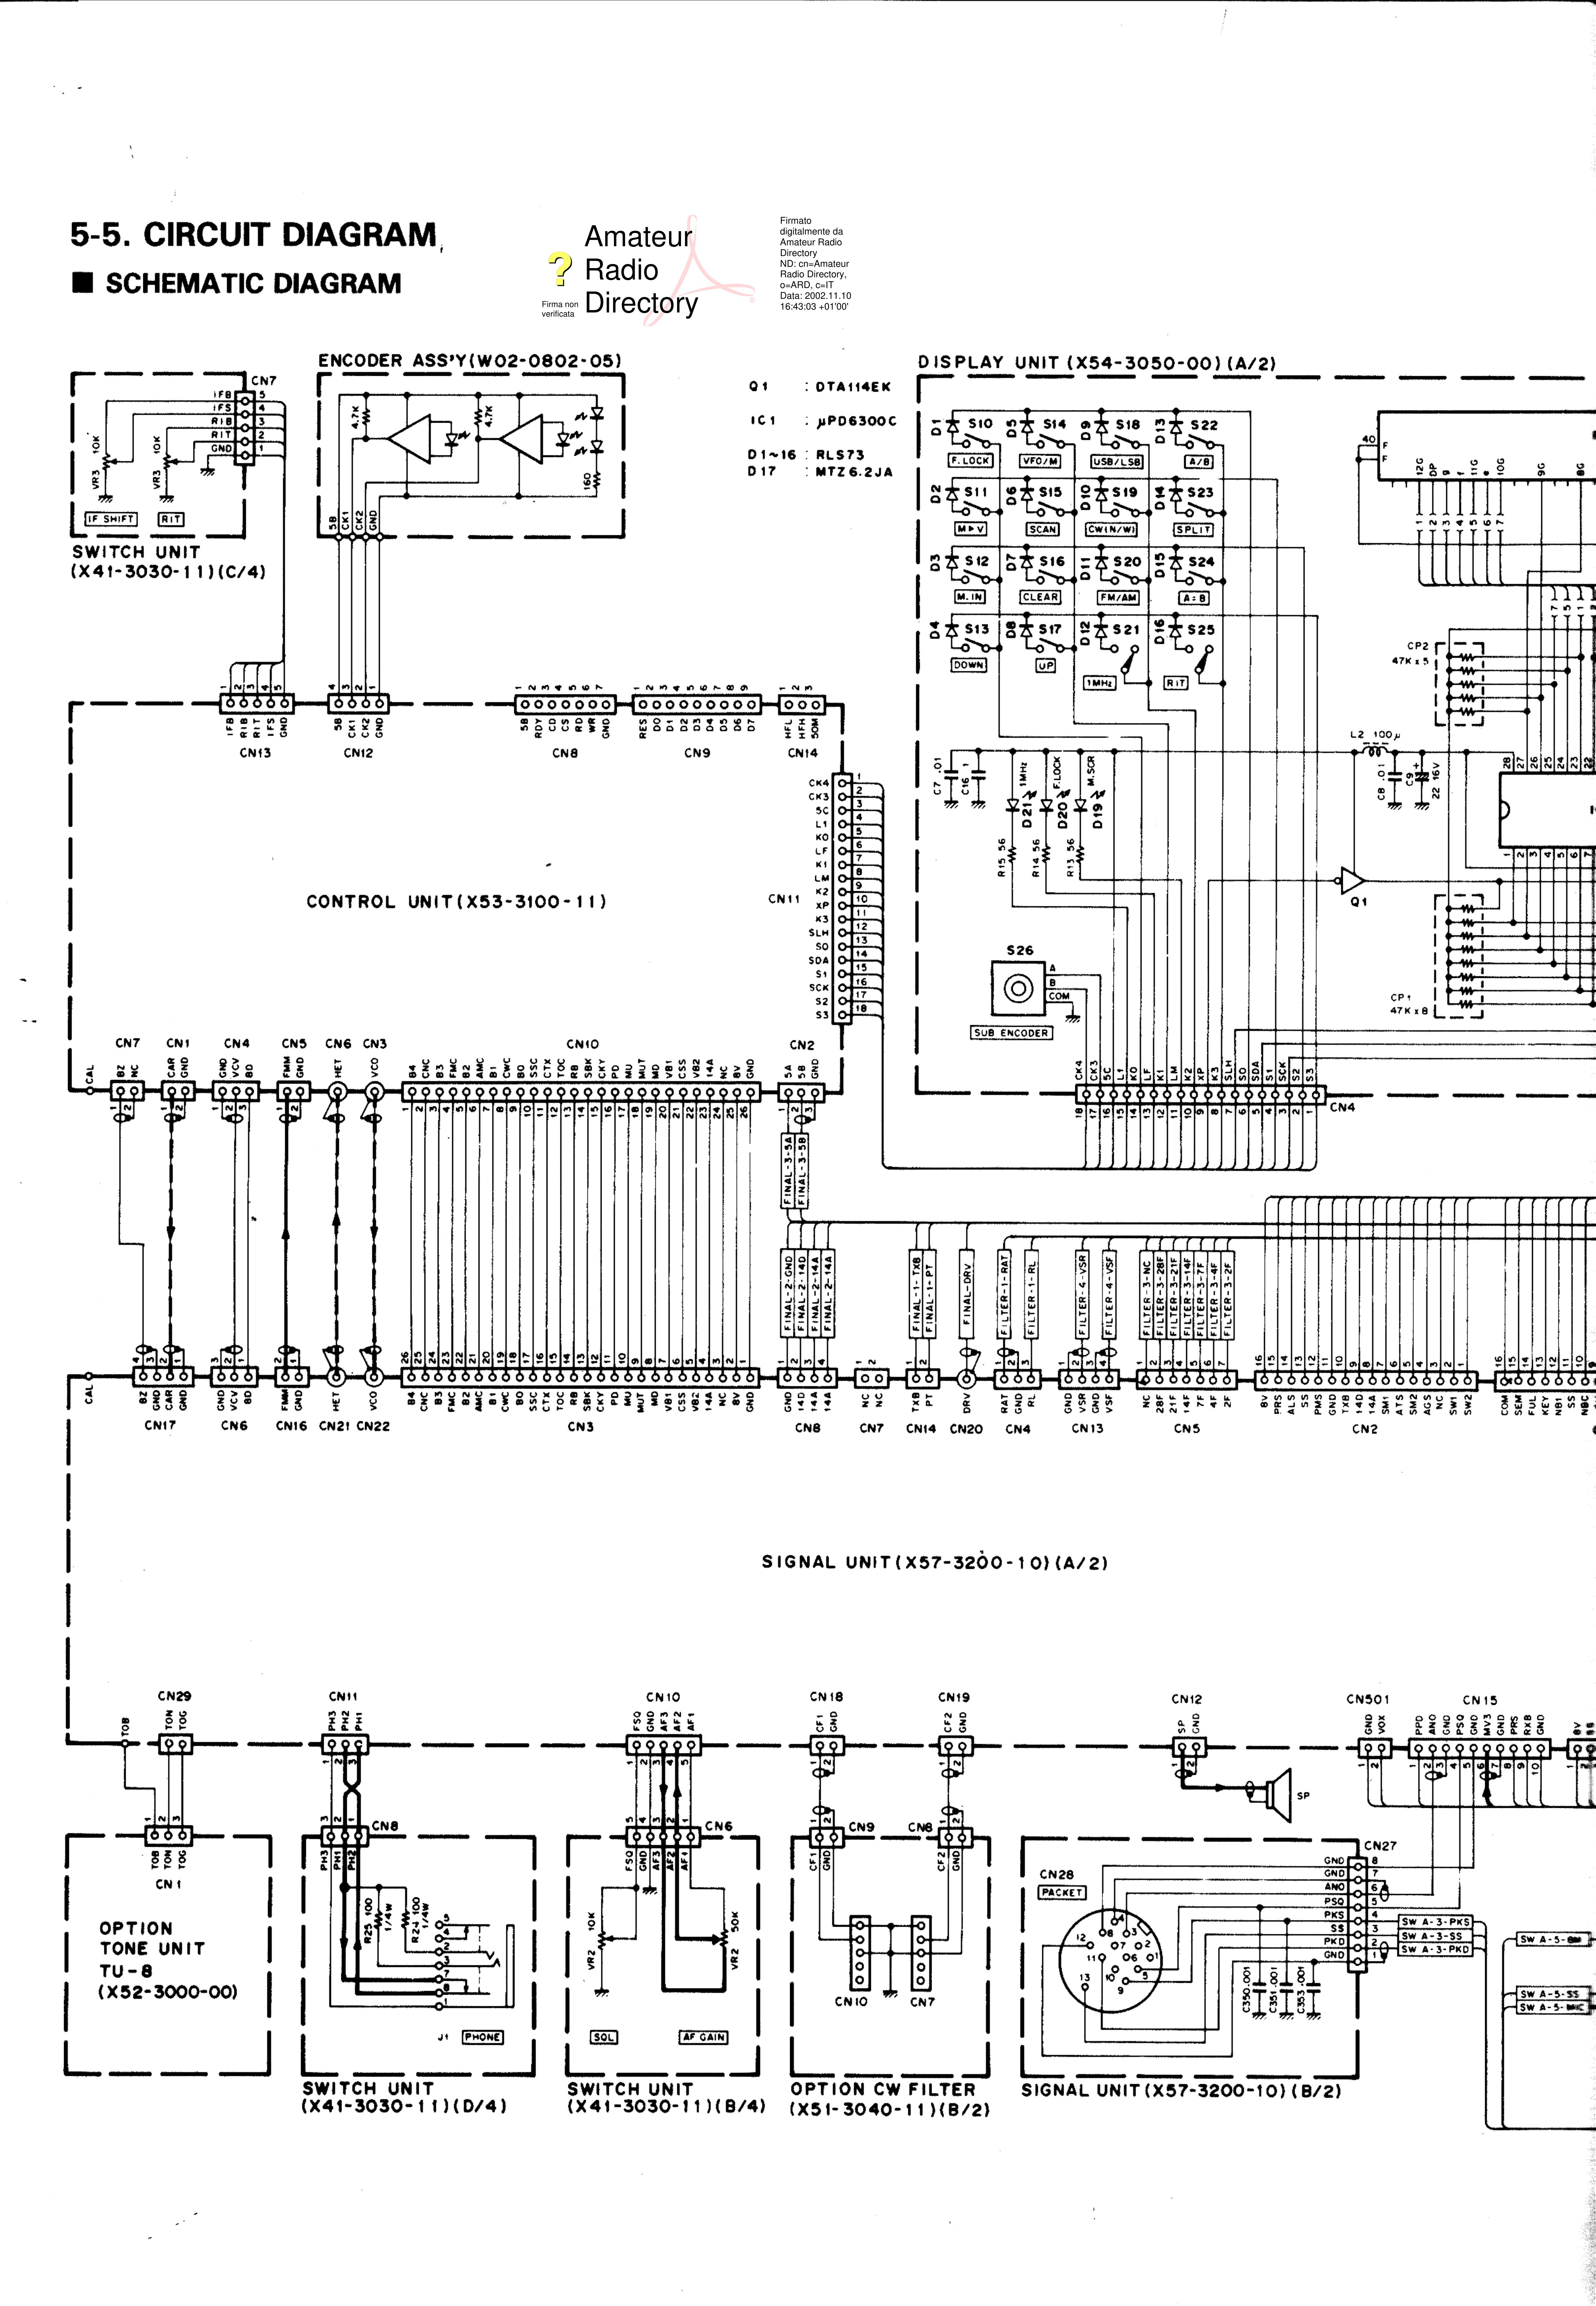 Kenwood TS-140S Manuel d/'instructions